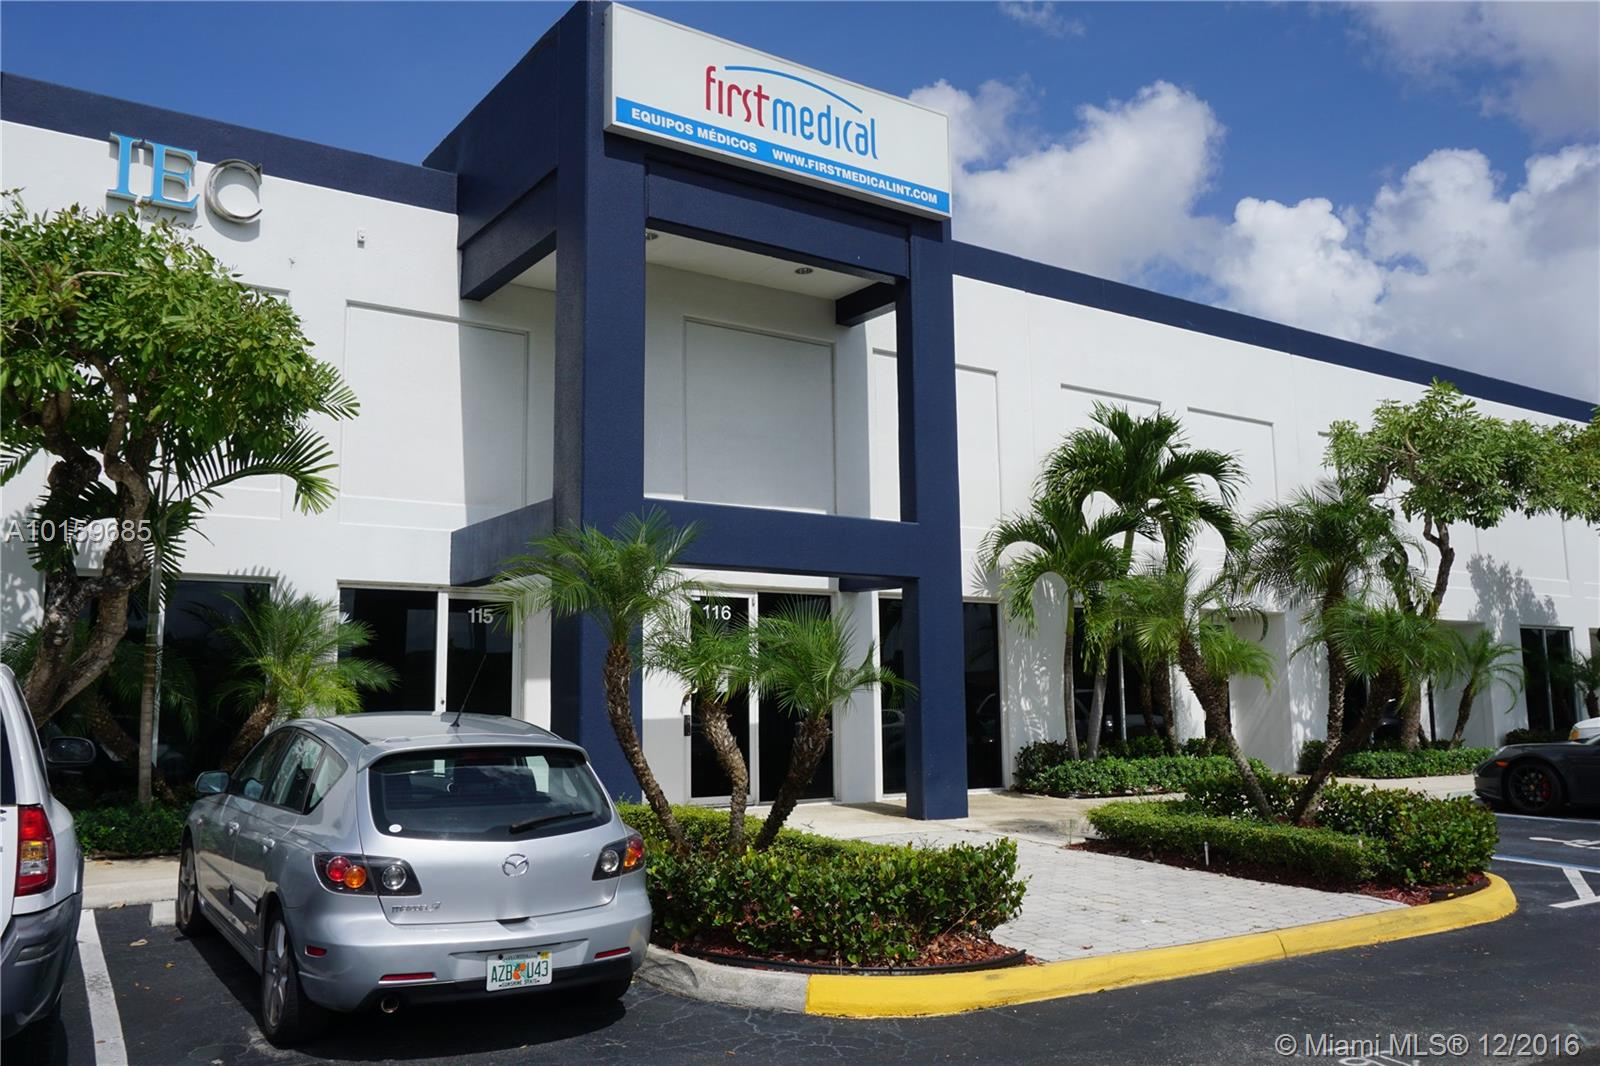 7640 NW 25 street # 115, FL 33122